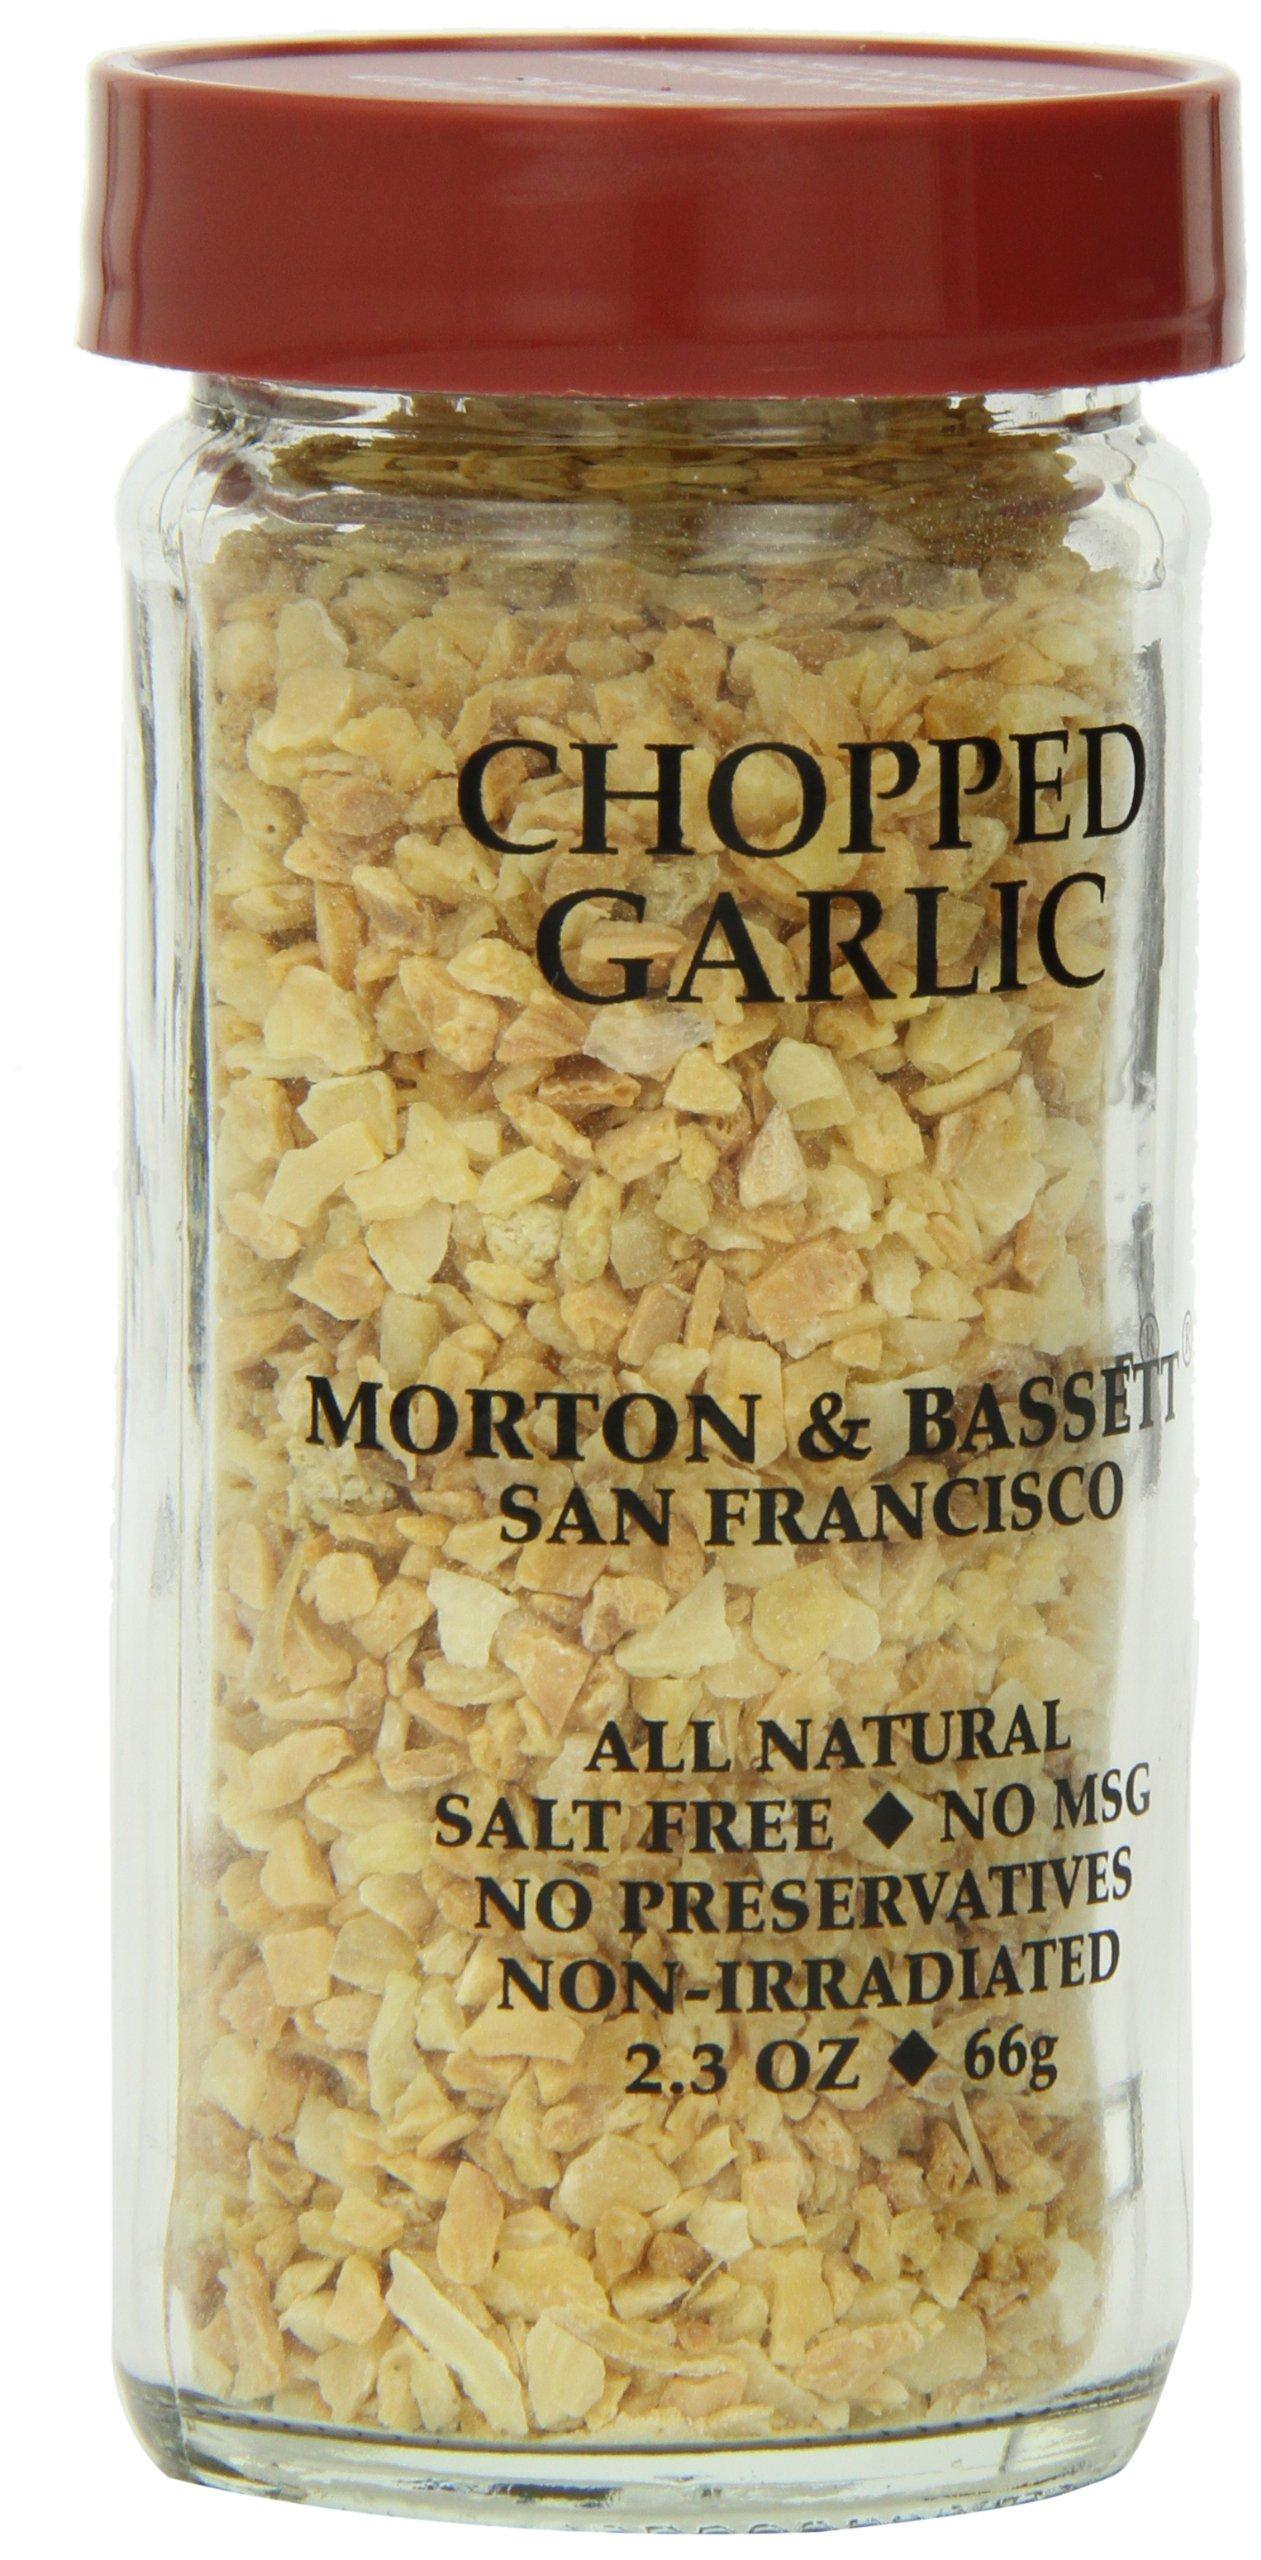 Morton & Bassett Chopped Garlic, 2.3-Ounce Jars (Pack of 3)